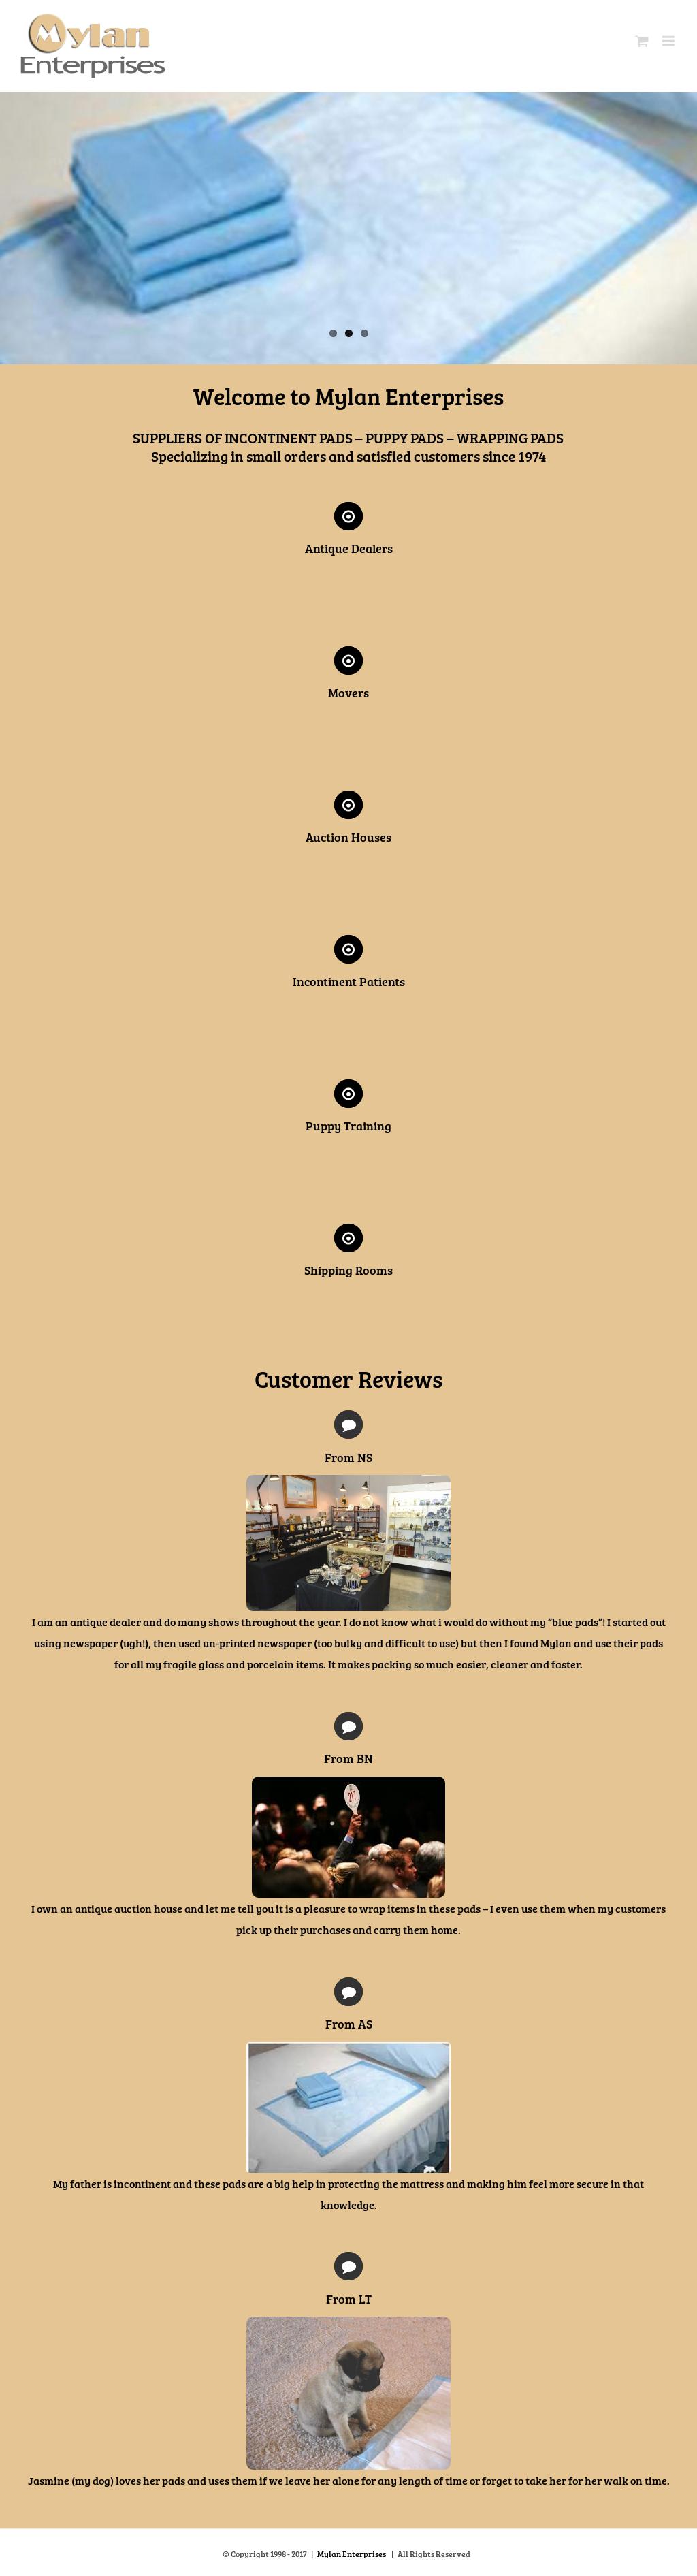 Mylan Enterprises Competitors, Revenue and Employees - Owler Company